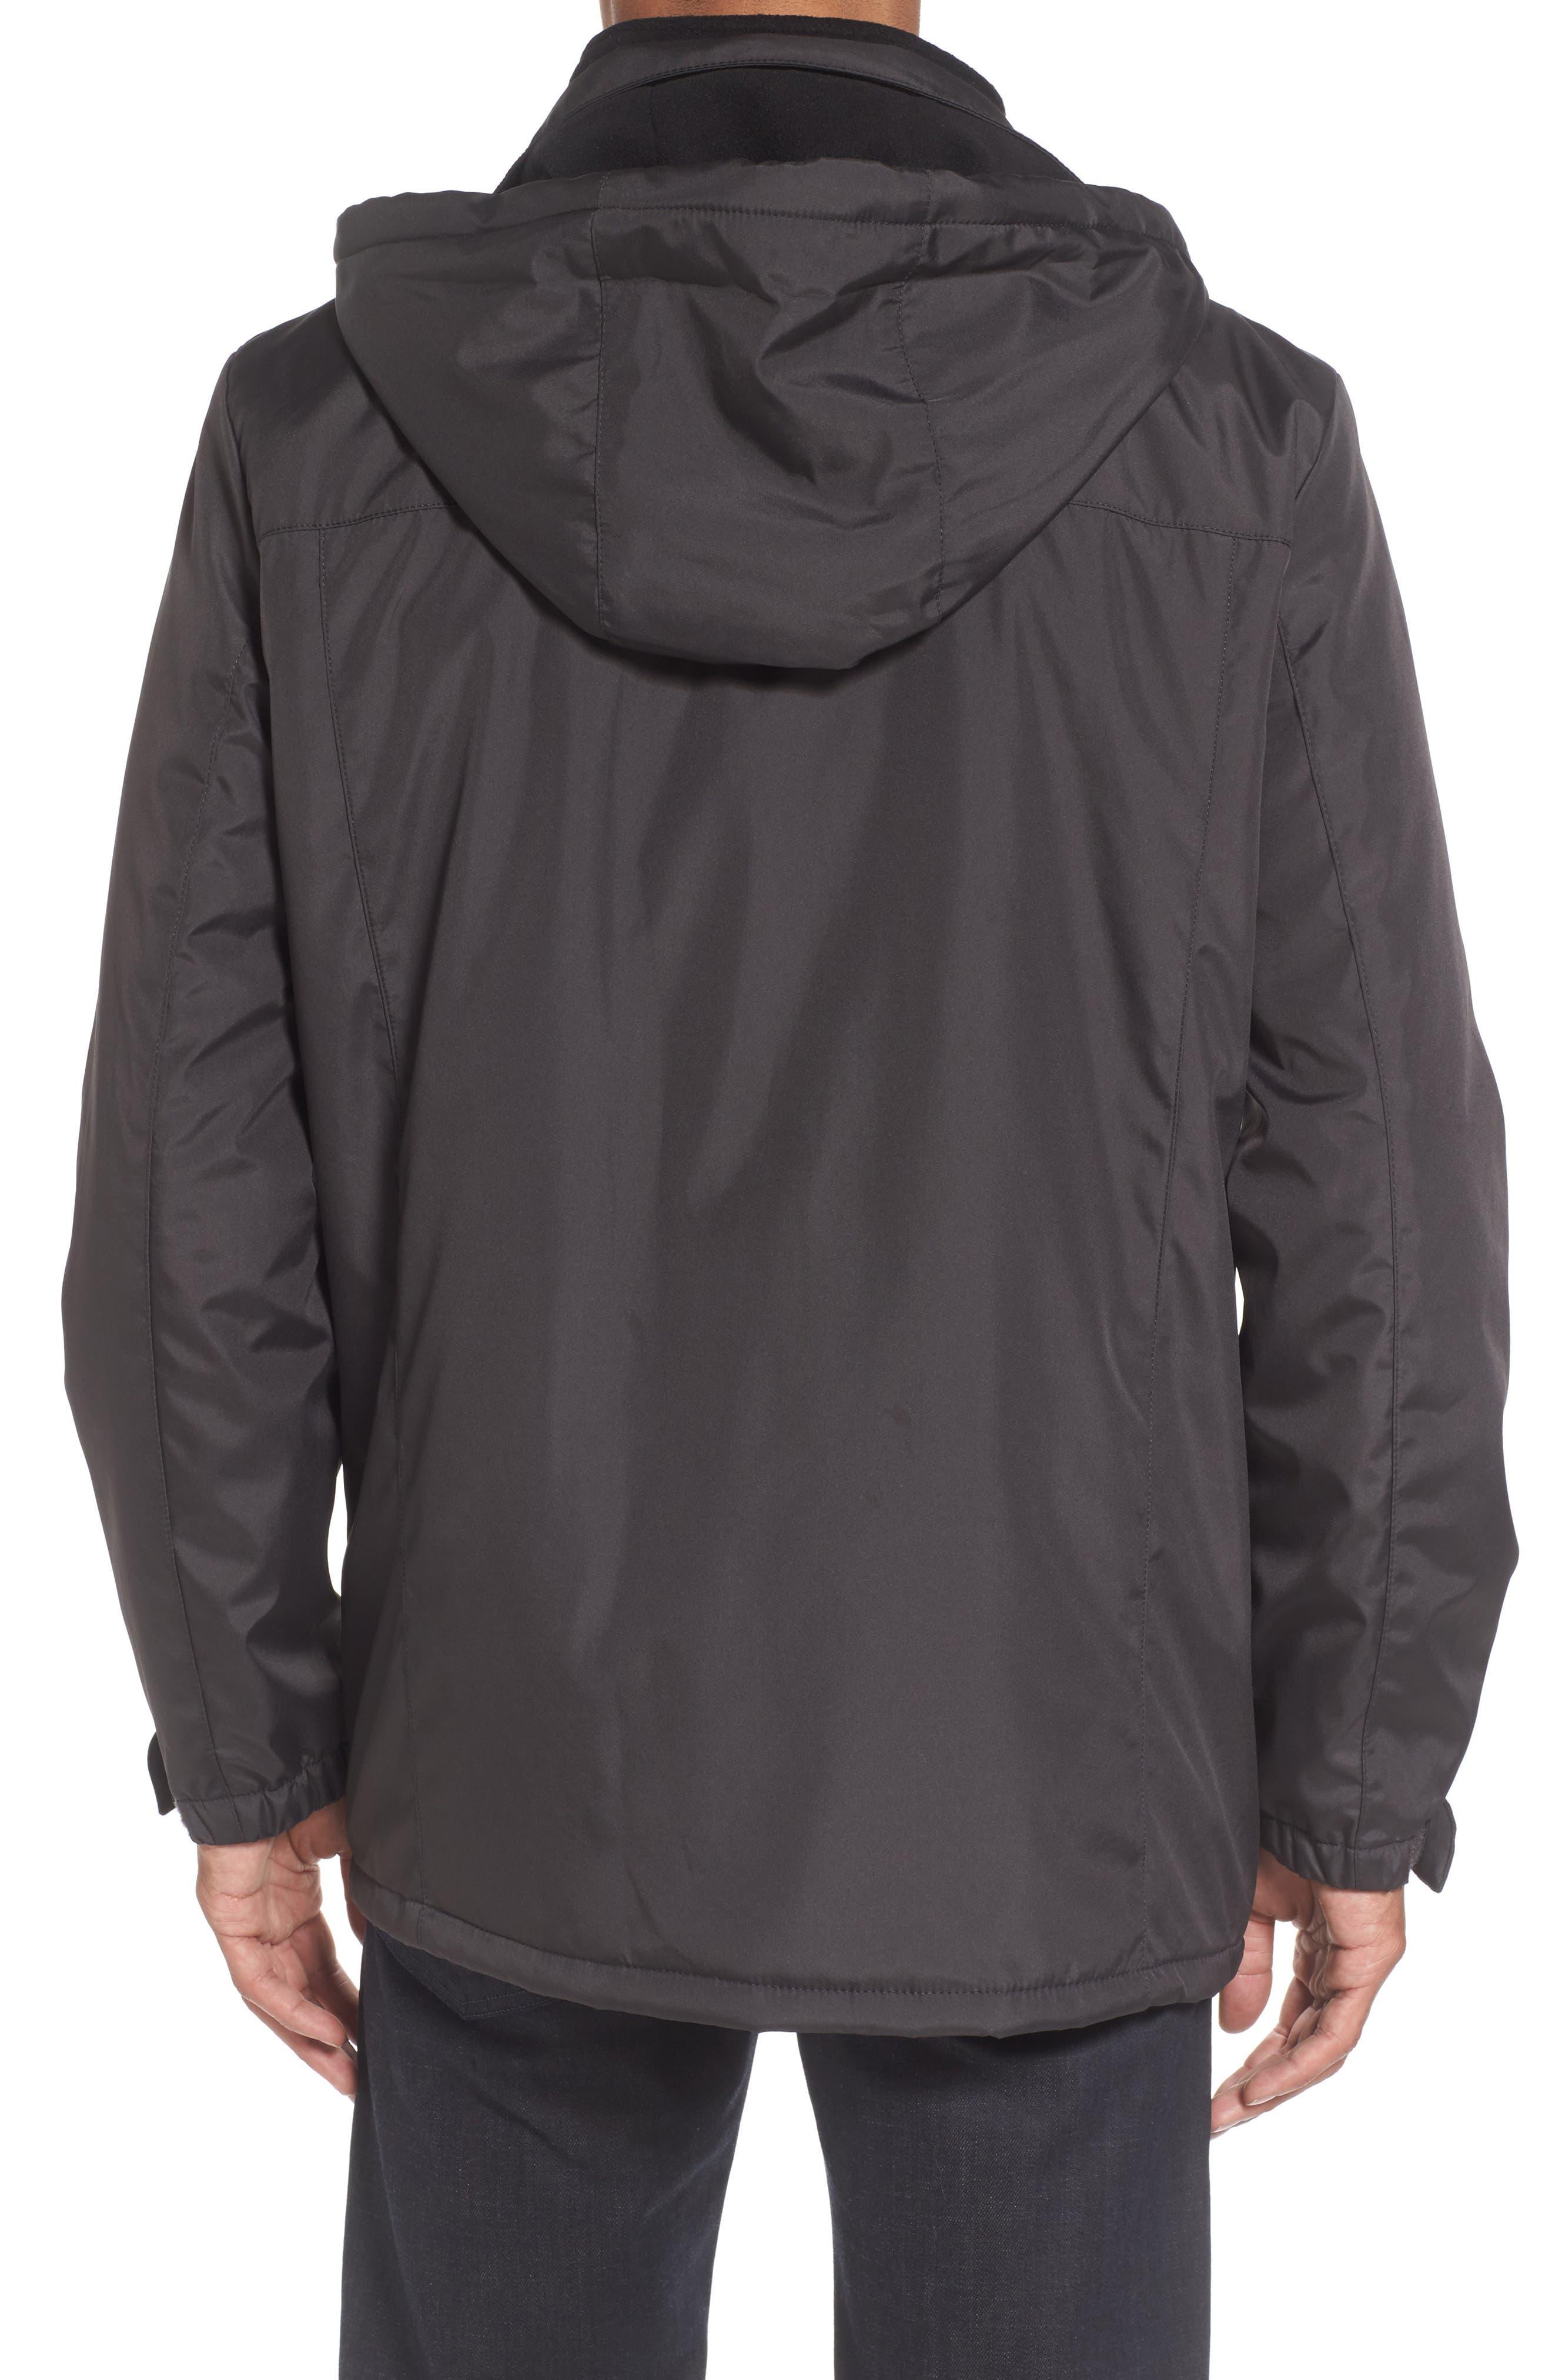 Hooded Jacket with Inset Fleece Bib,                             Alternate thumbnail 6, color,